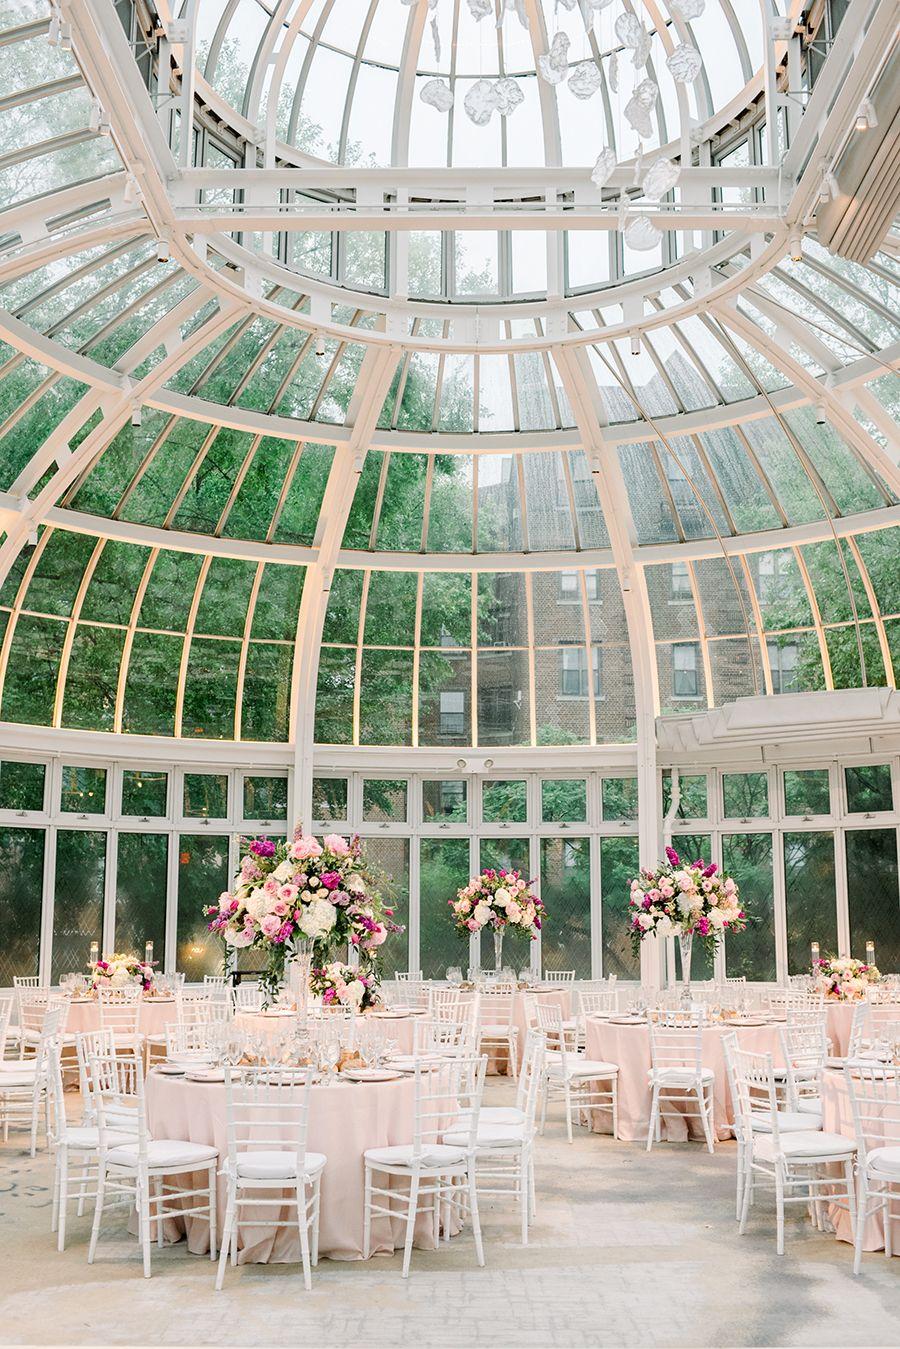 The Palm House At Brooklyn Botanic Garden Wedding That Barely Beat The Rain Botanical Gardens Wedding Brooklyn Botanical Garden Brooklyn Botanical Garden Wedding